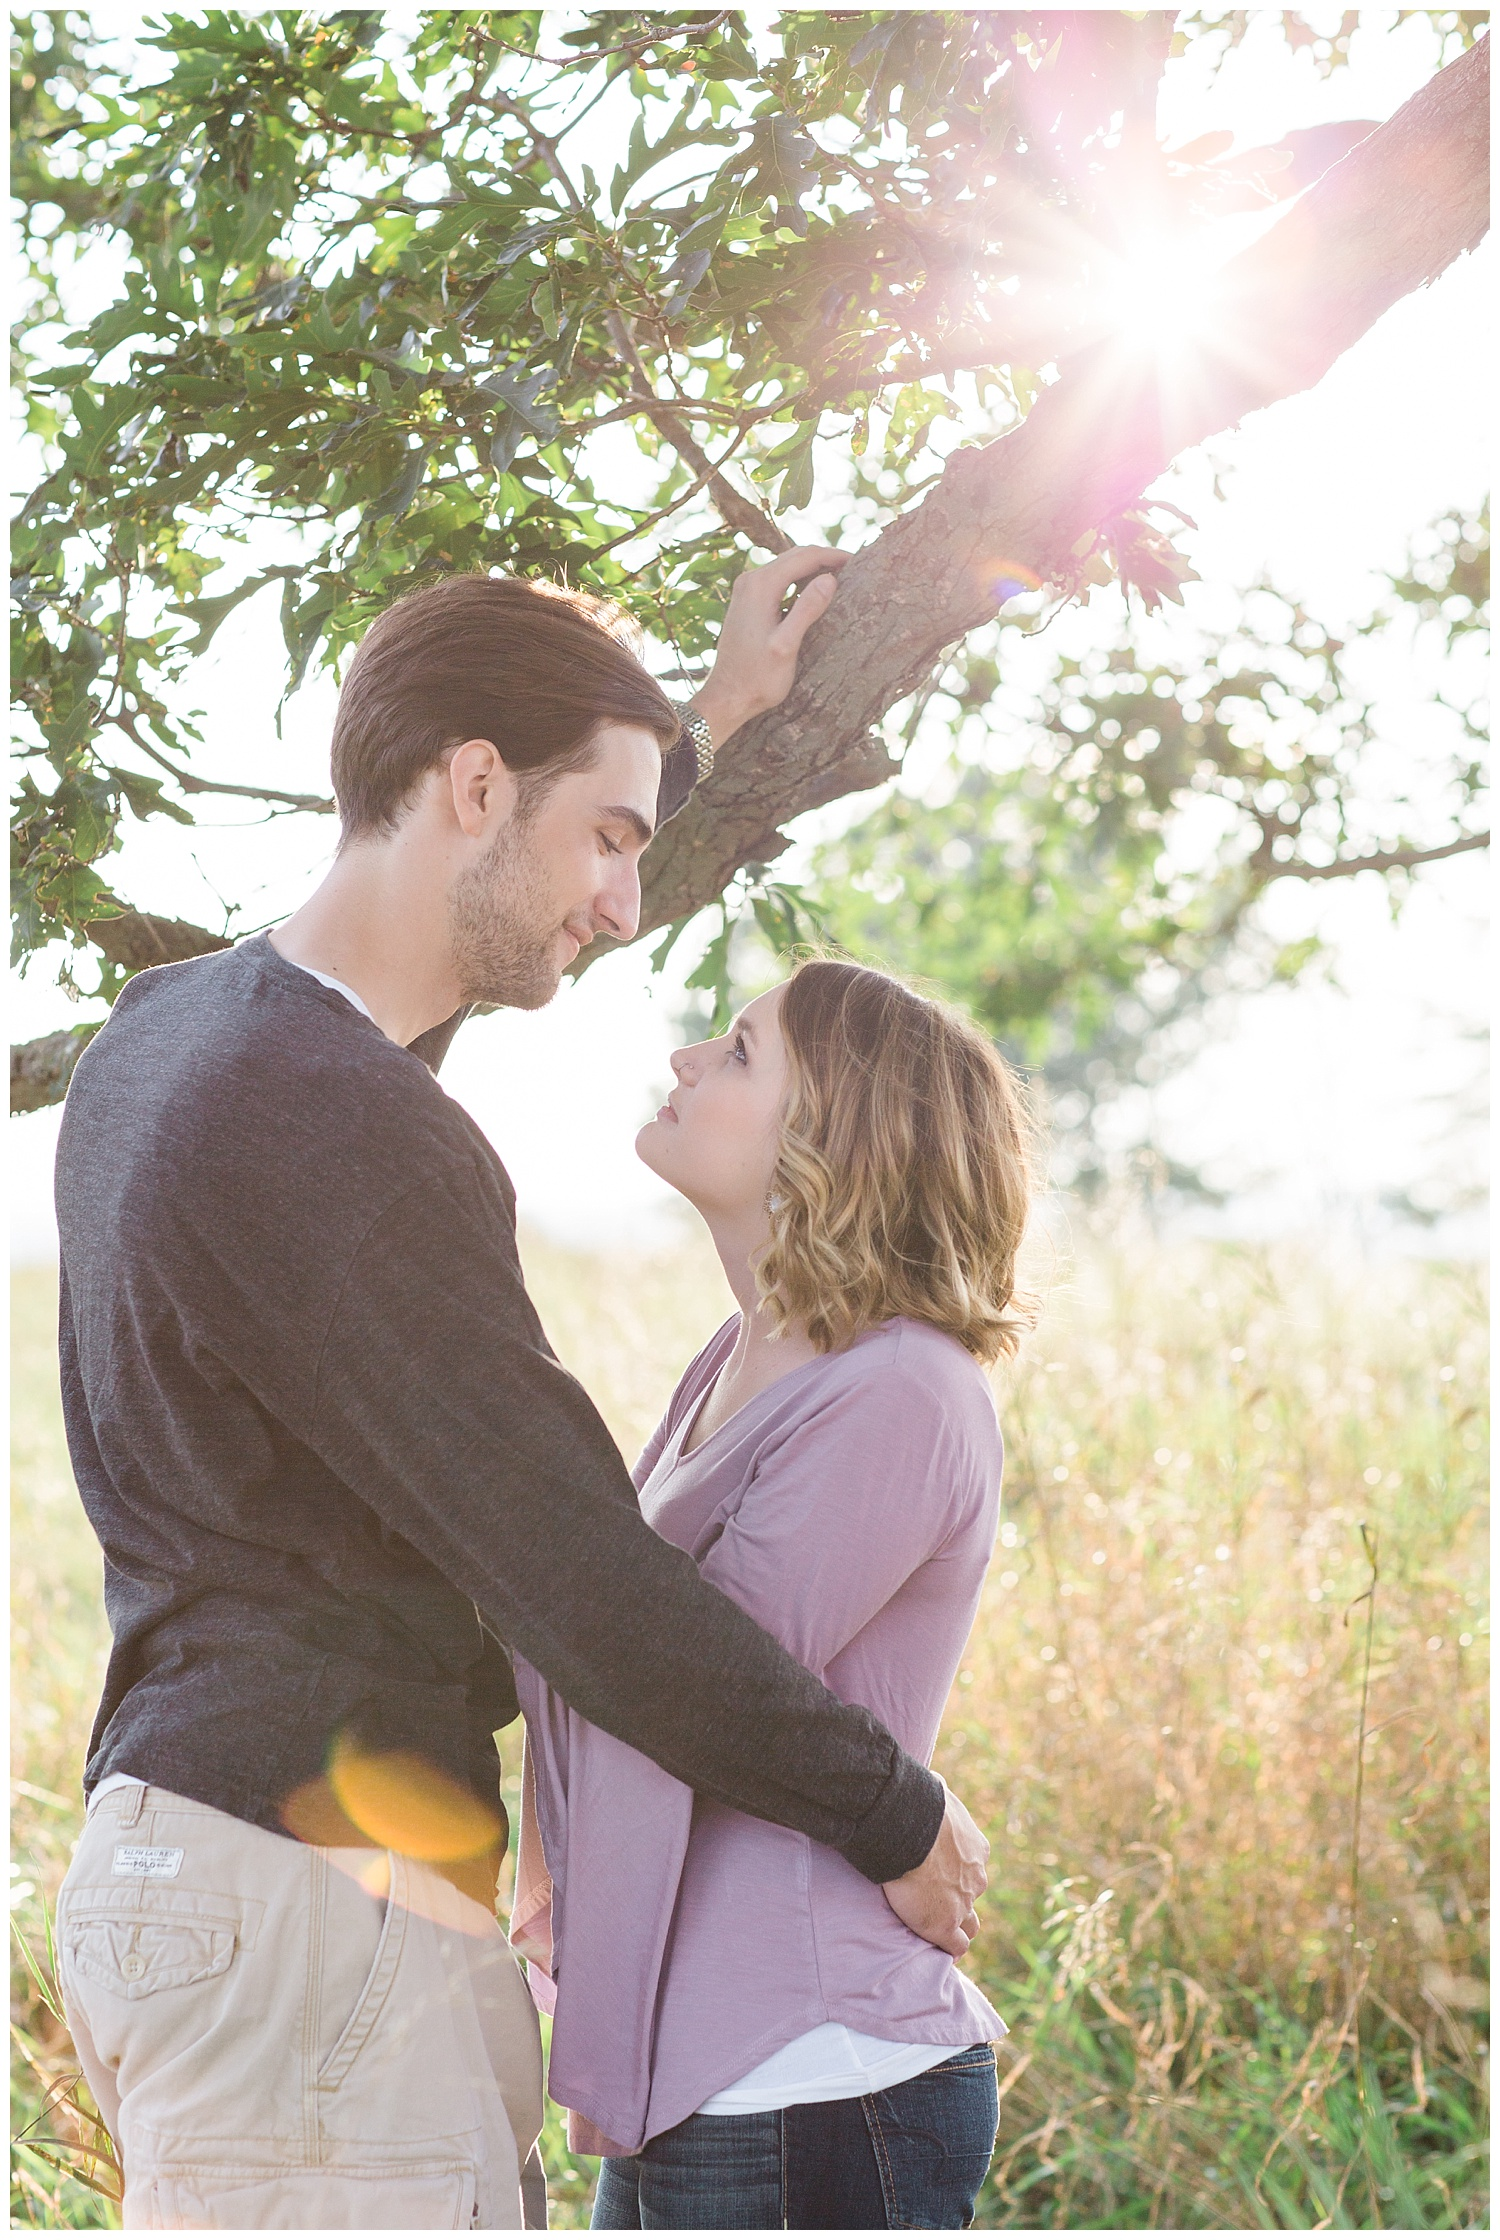 Tanya and Ryan - Sweetheart session - Lass & Beau - Geneseo NY-218_Buffalo wedding photography.jpg